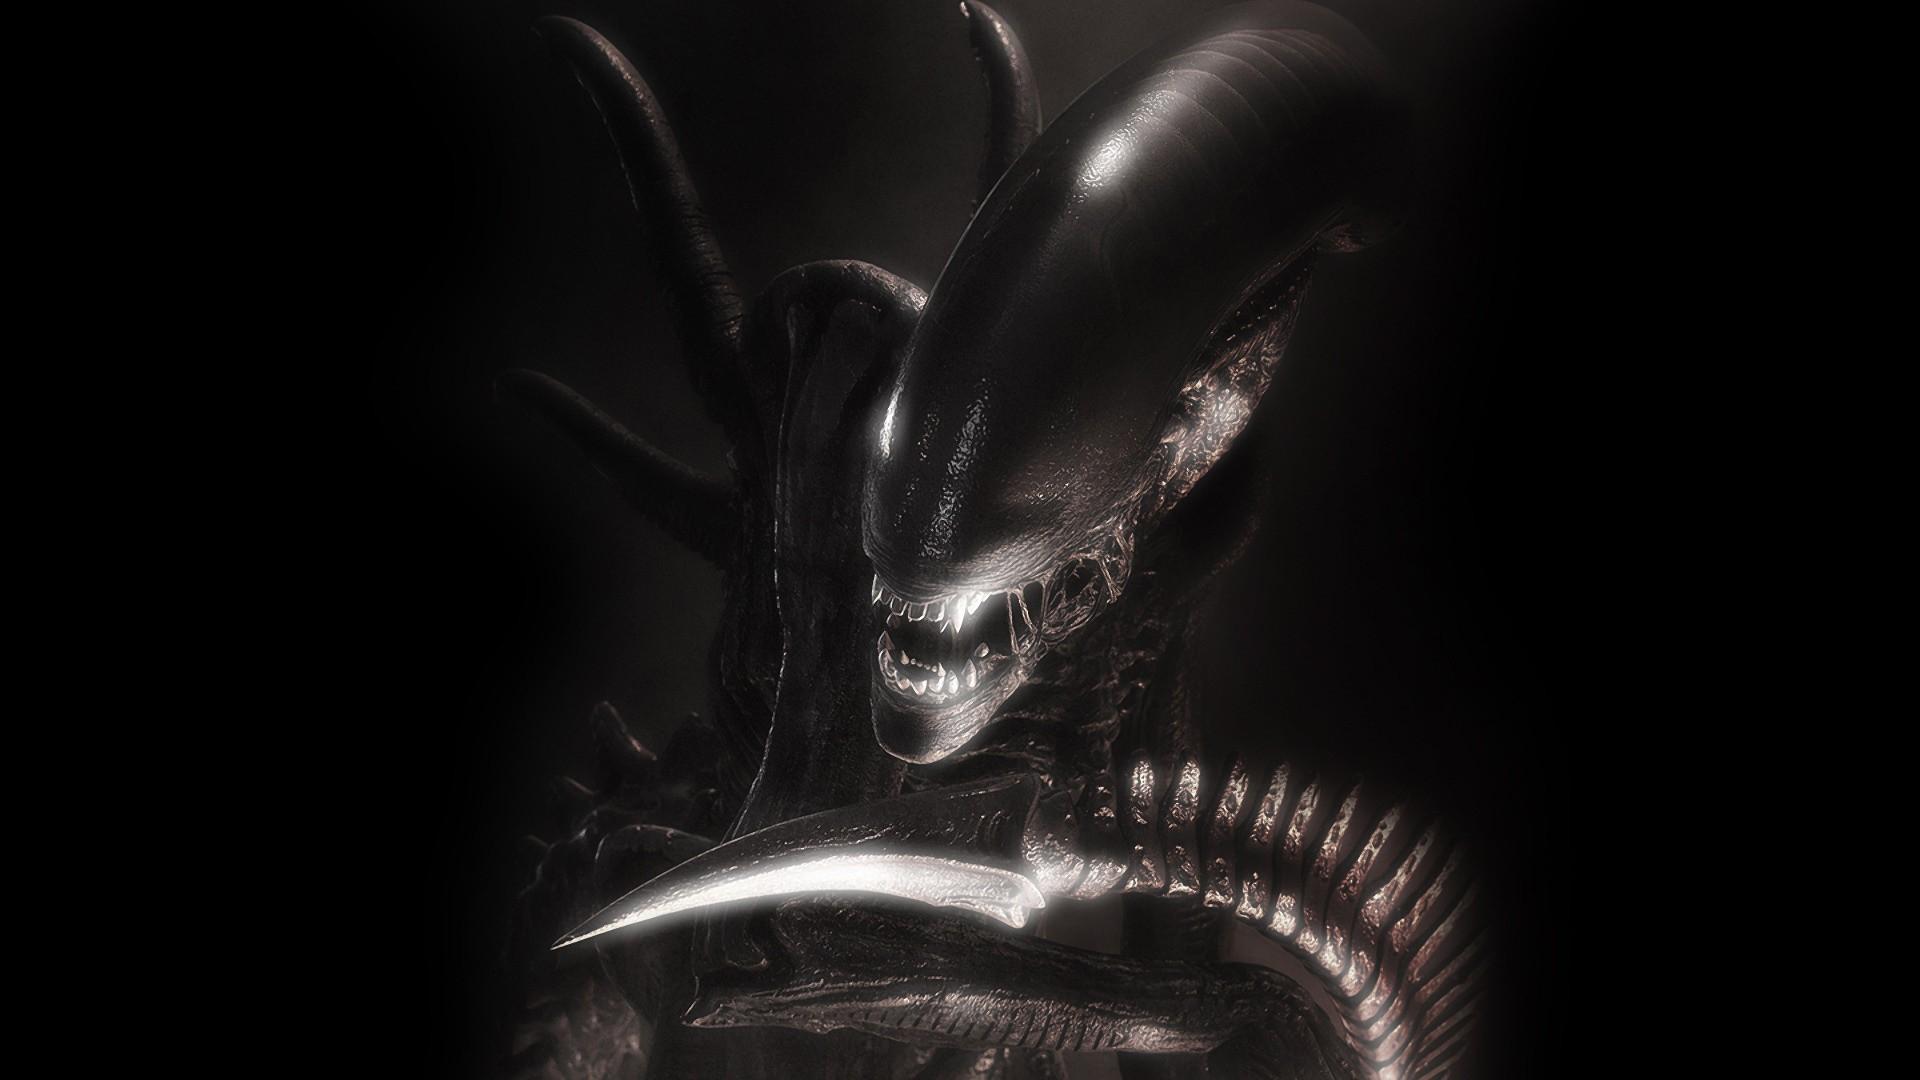 H R Giger Alien movie Xenomorph Wallpapers HD 1920x1080